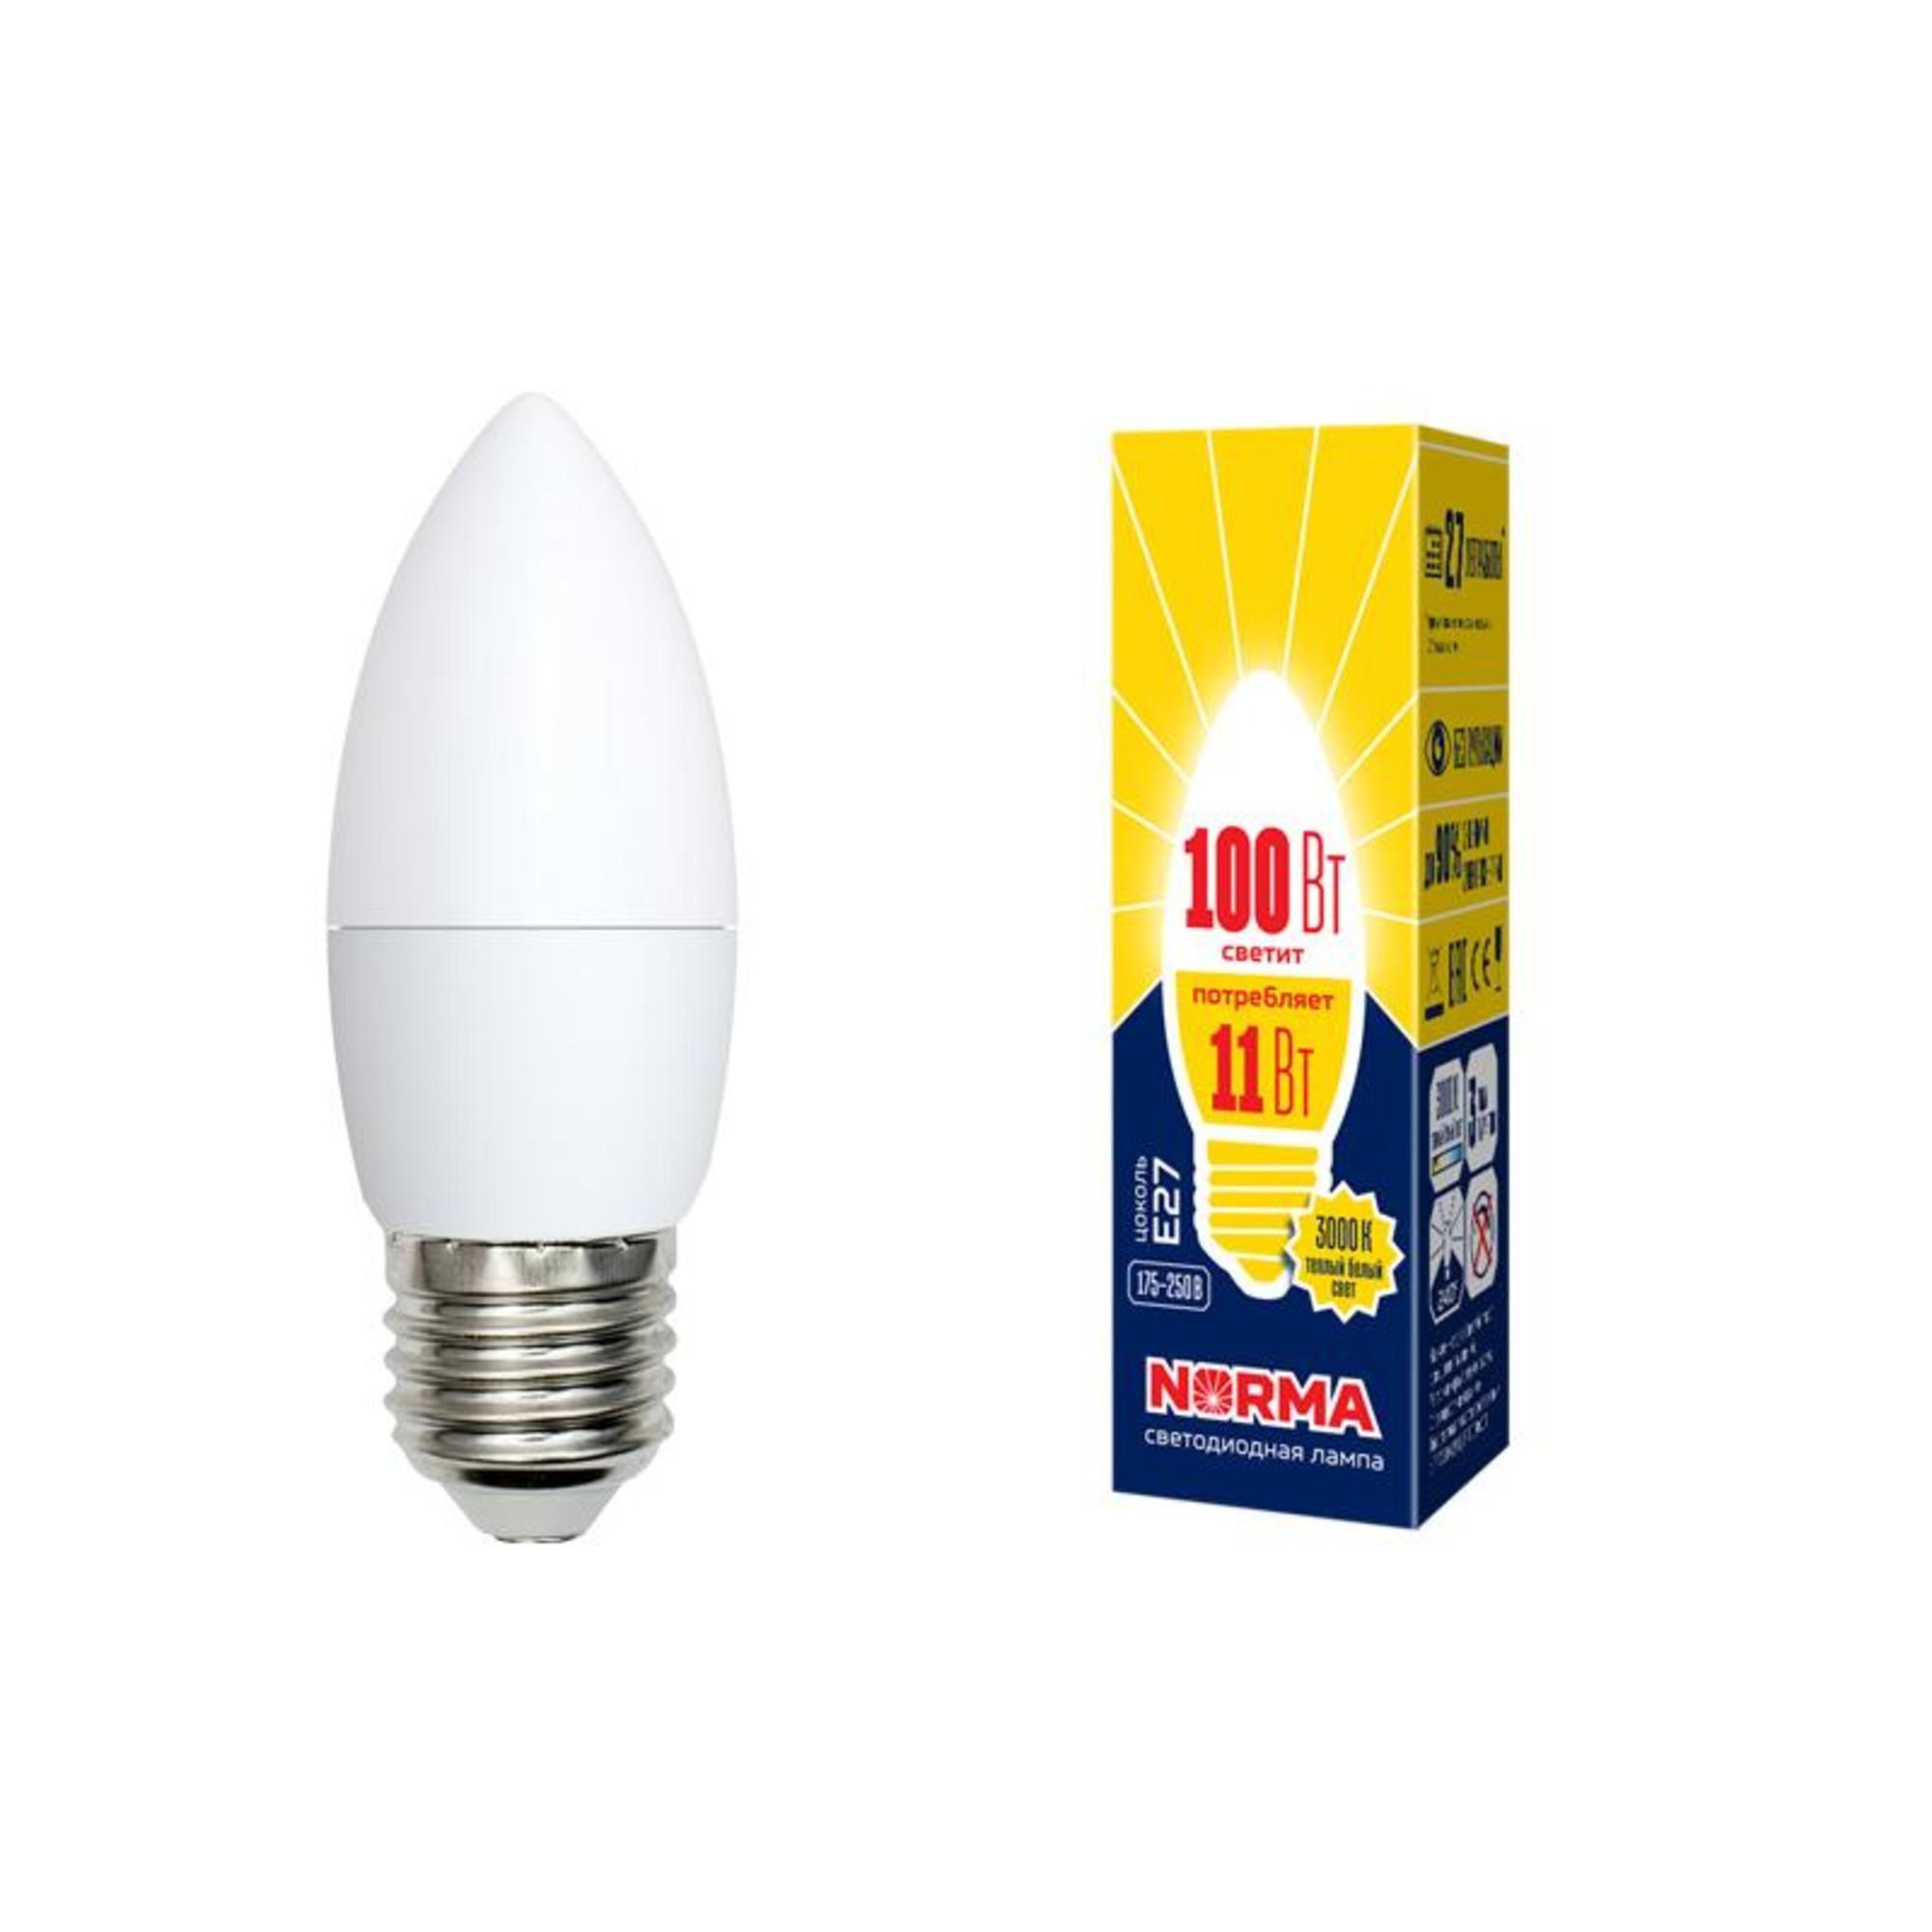 Лампа Volpe светодиодная E27 11 Вт теплый свет